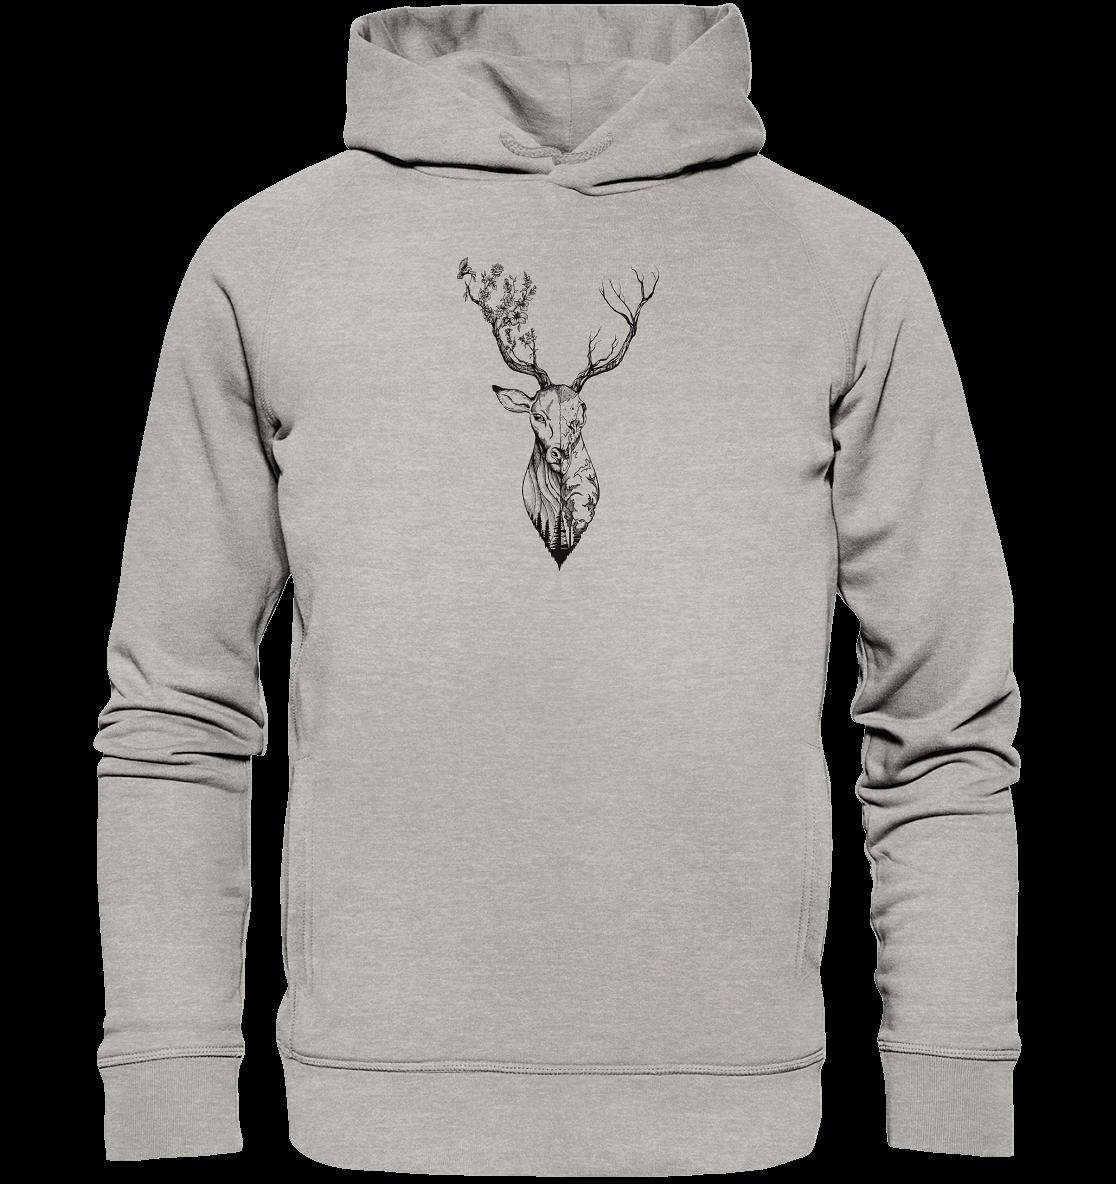 front-organic-fashion-hoodie-c2c1c0-1116x-8.png